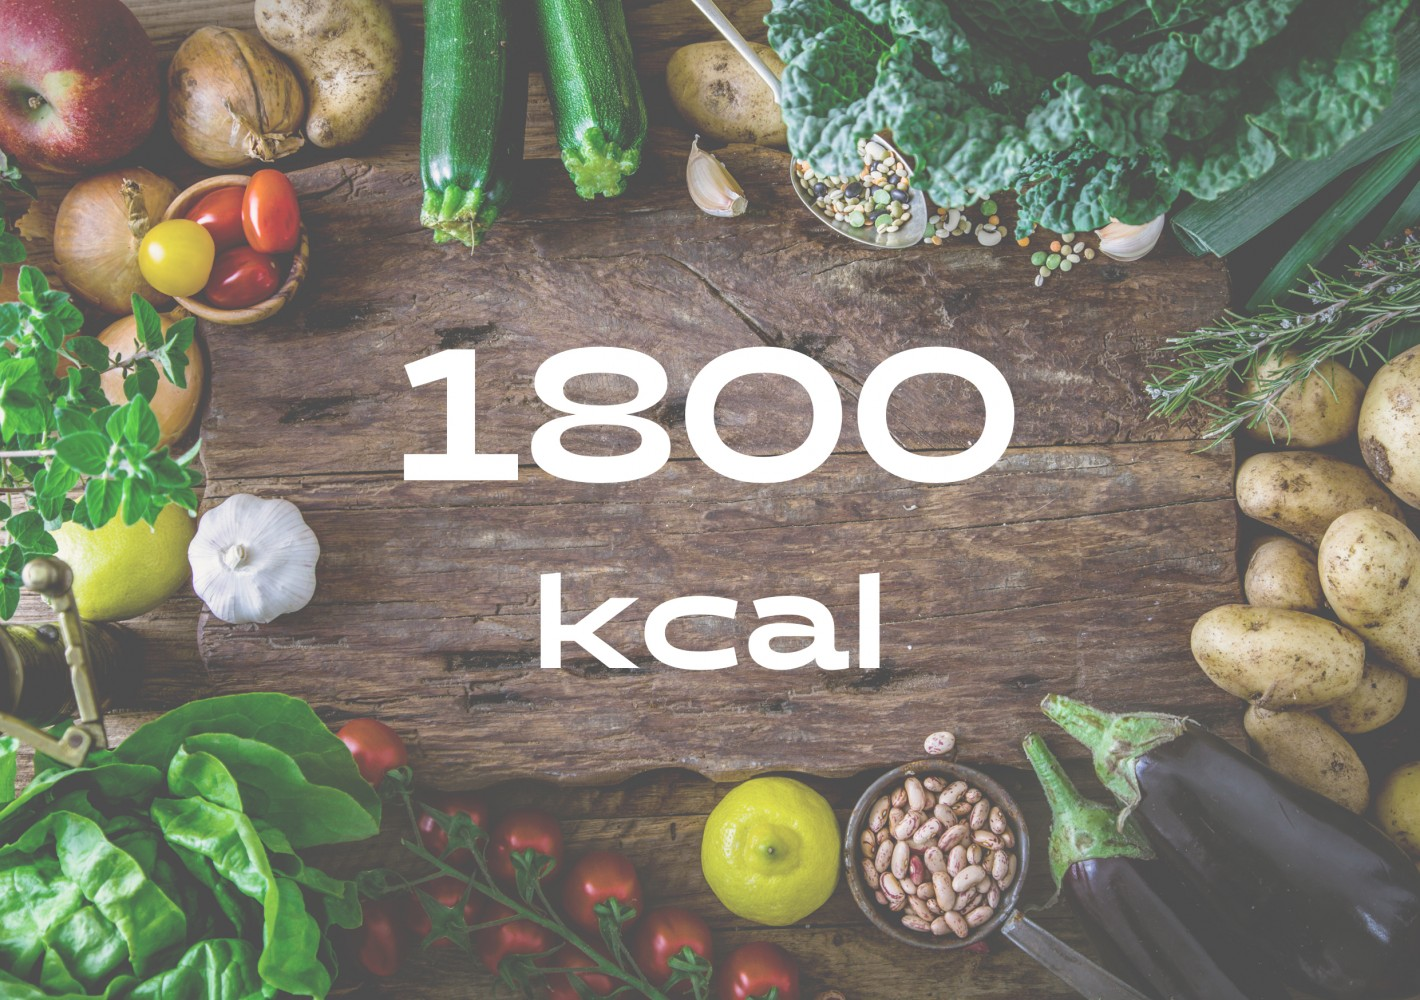 Ruokavalio 1800kcal